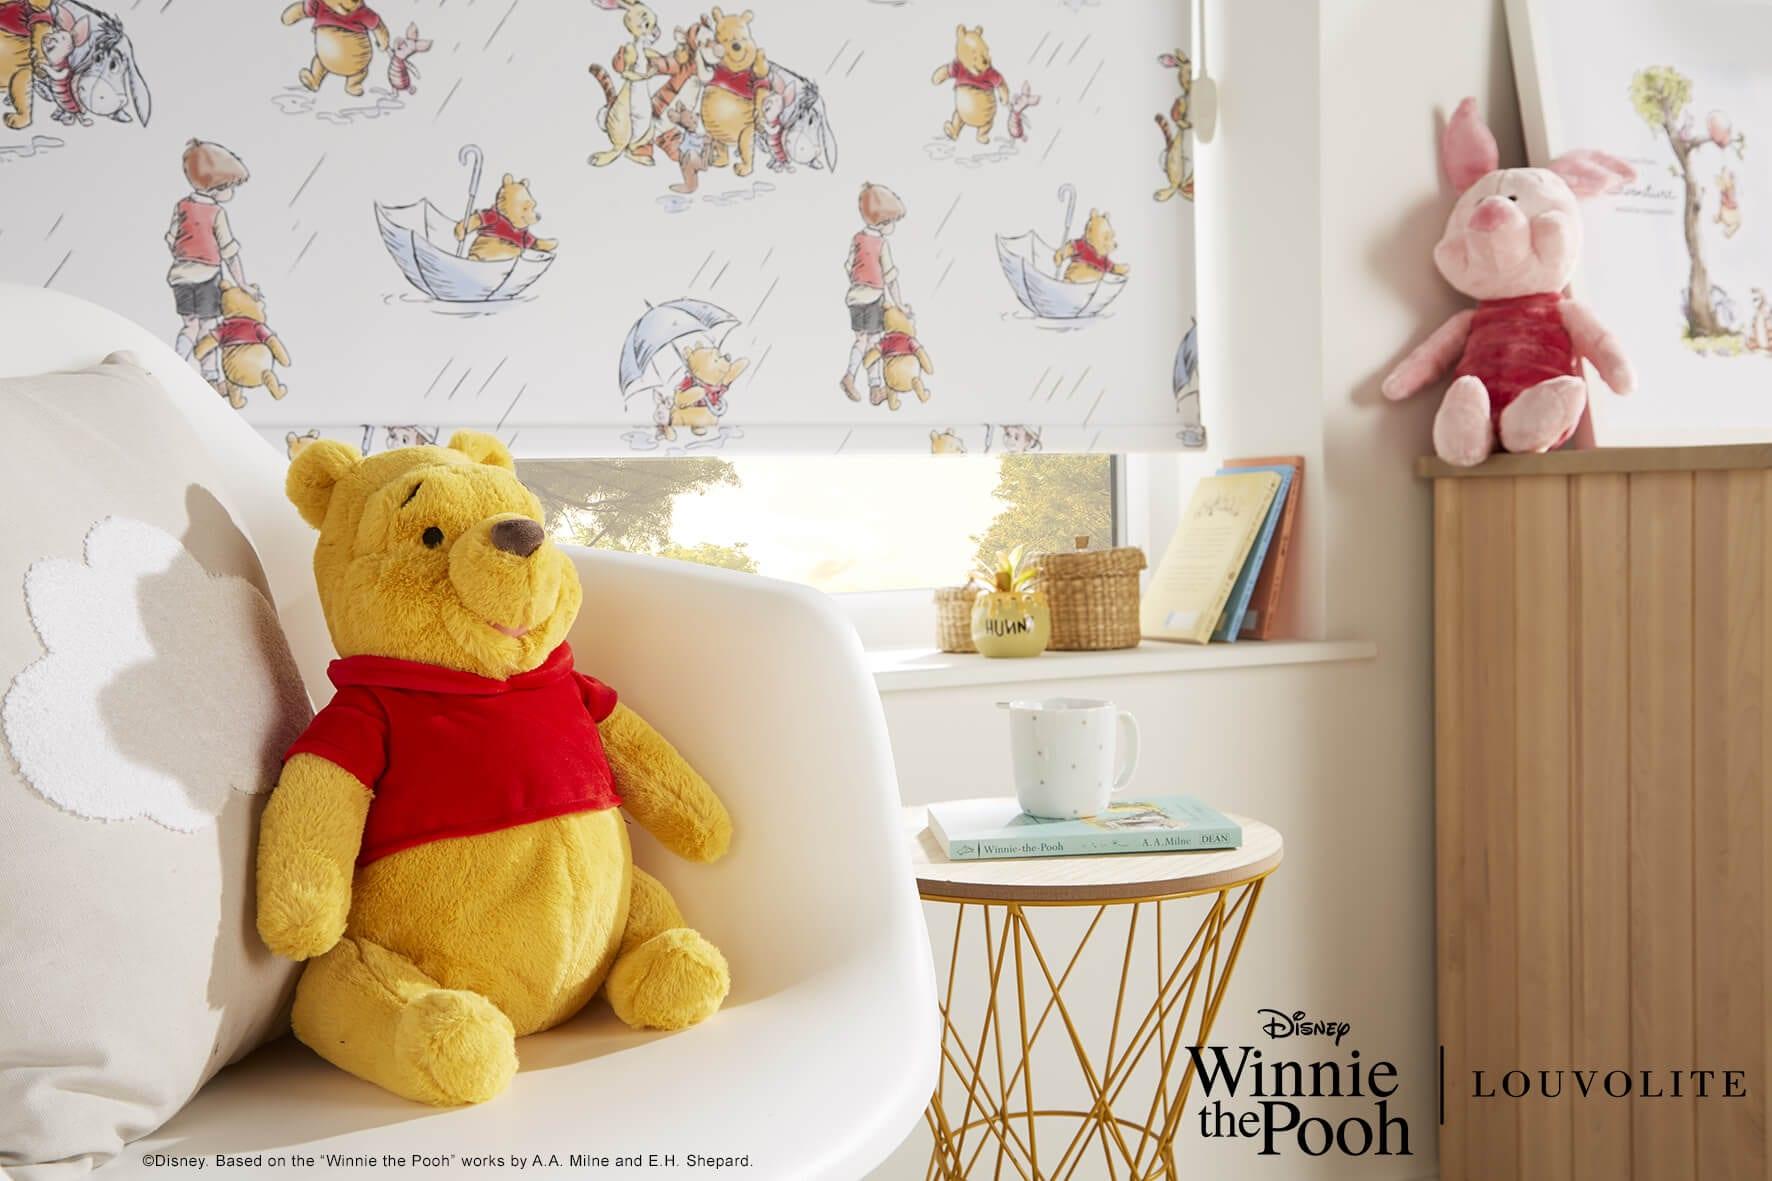 Disney Winnie the Poo roller blinds.